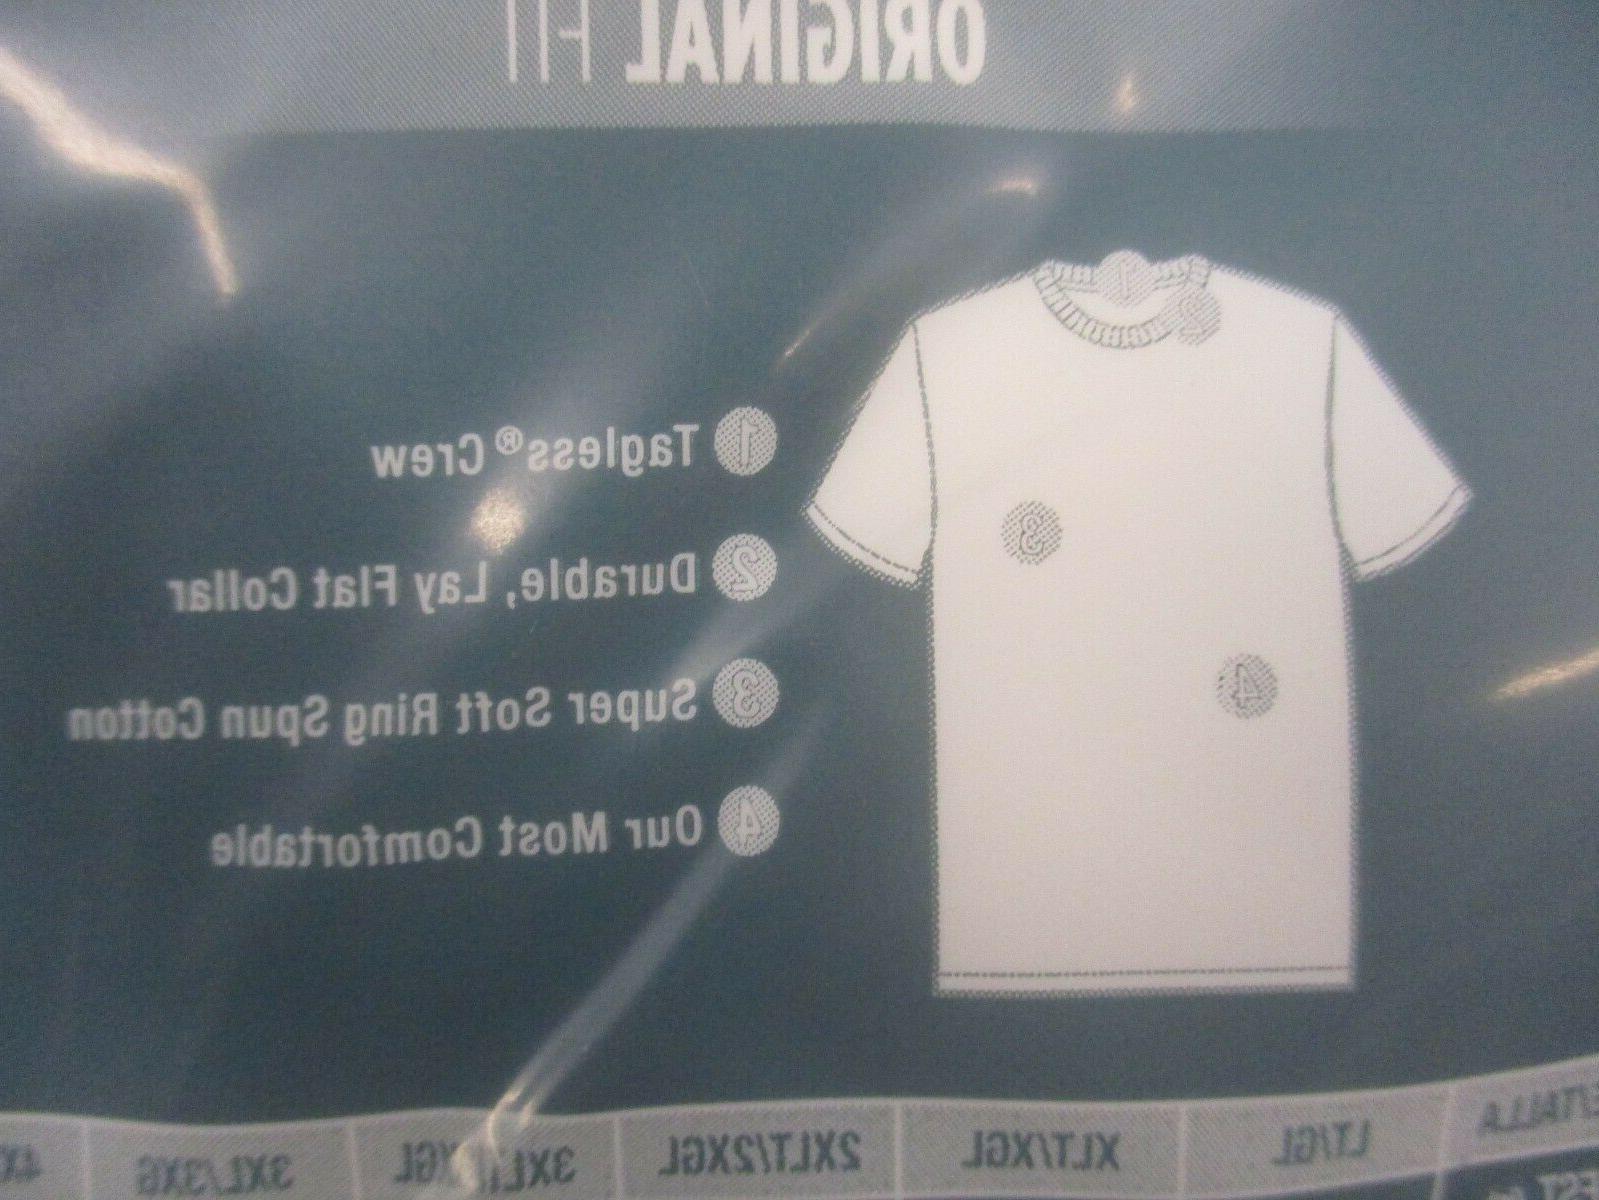 Hanes and Men's Neck Shirt IQ LT